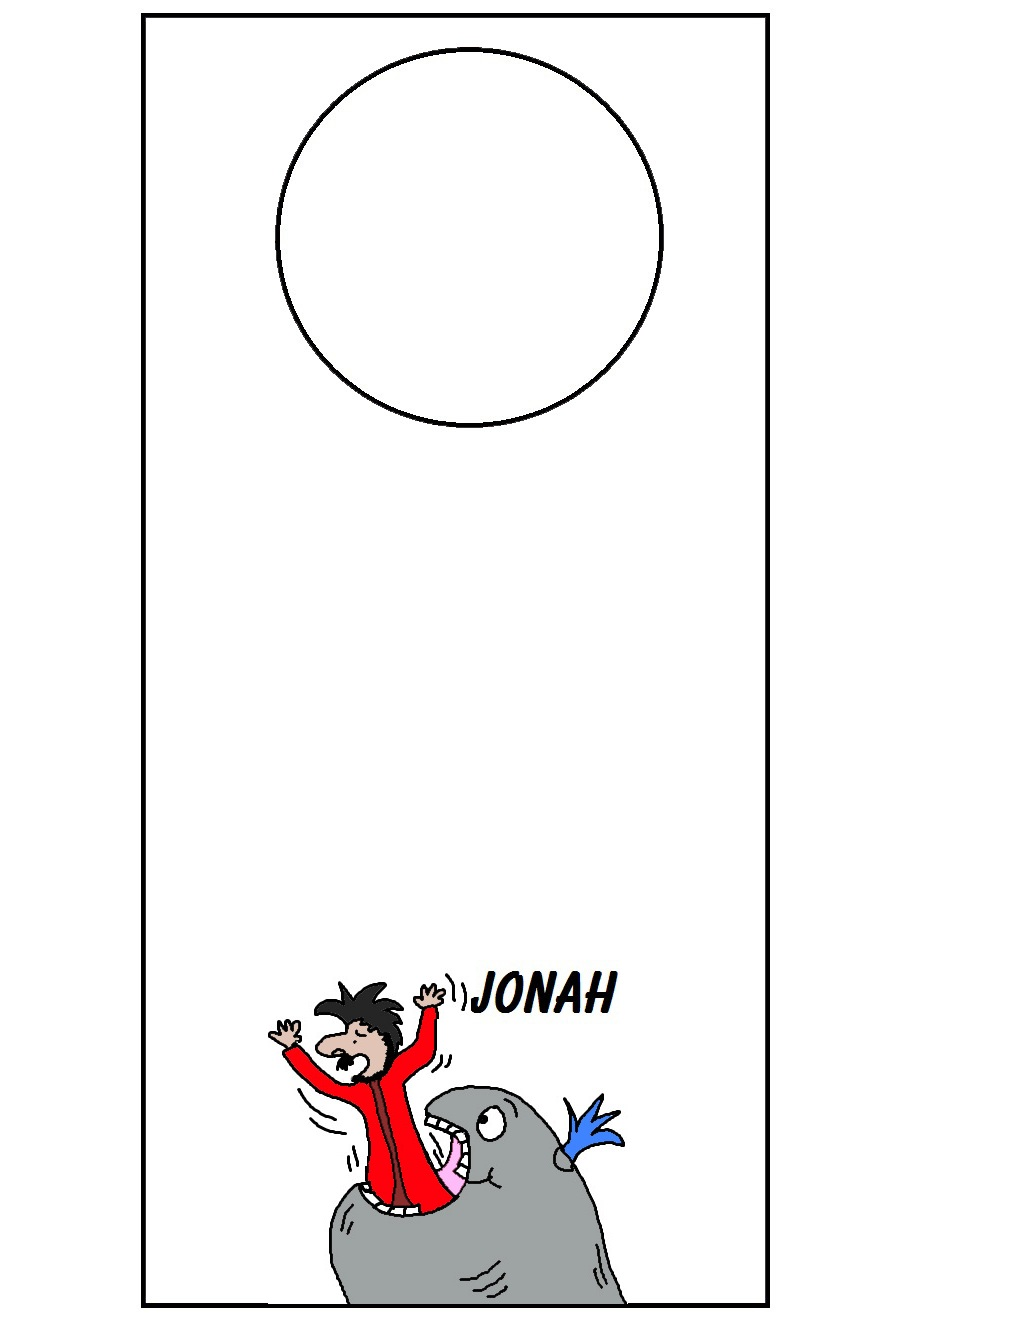 Jonah sunday school craft - Jonah And The Whale Doorknob Template